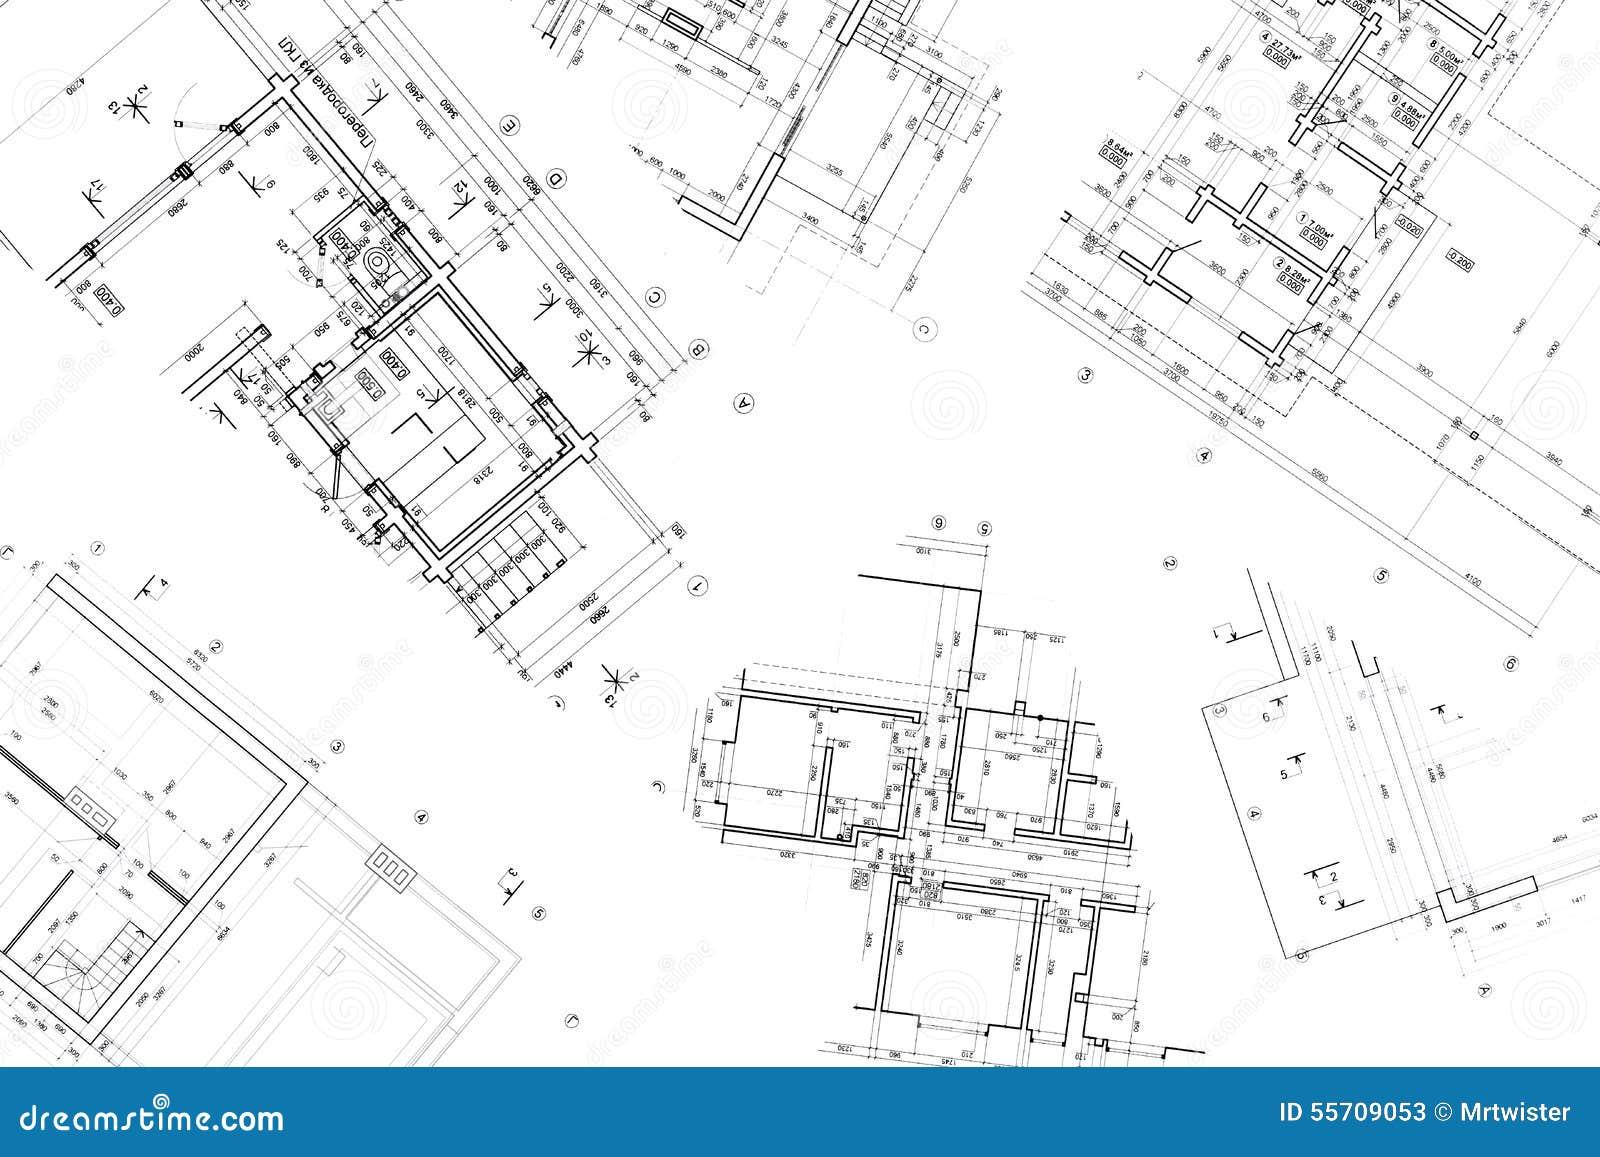 Construction Instructional and Informational Memoranda